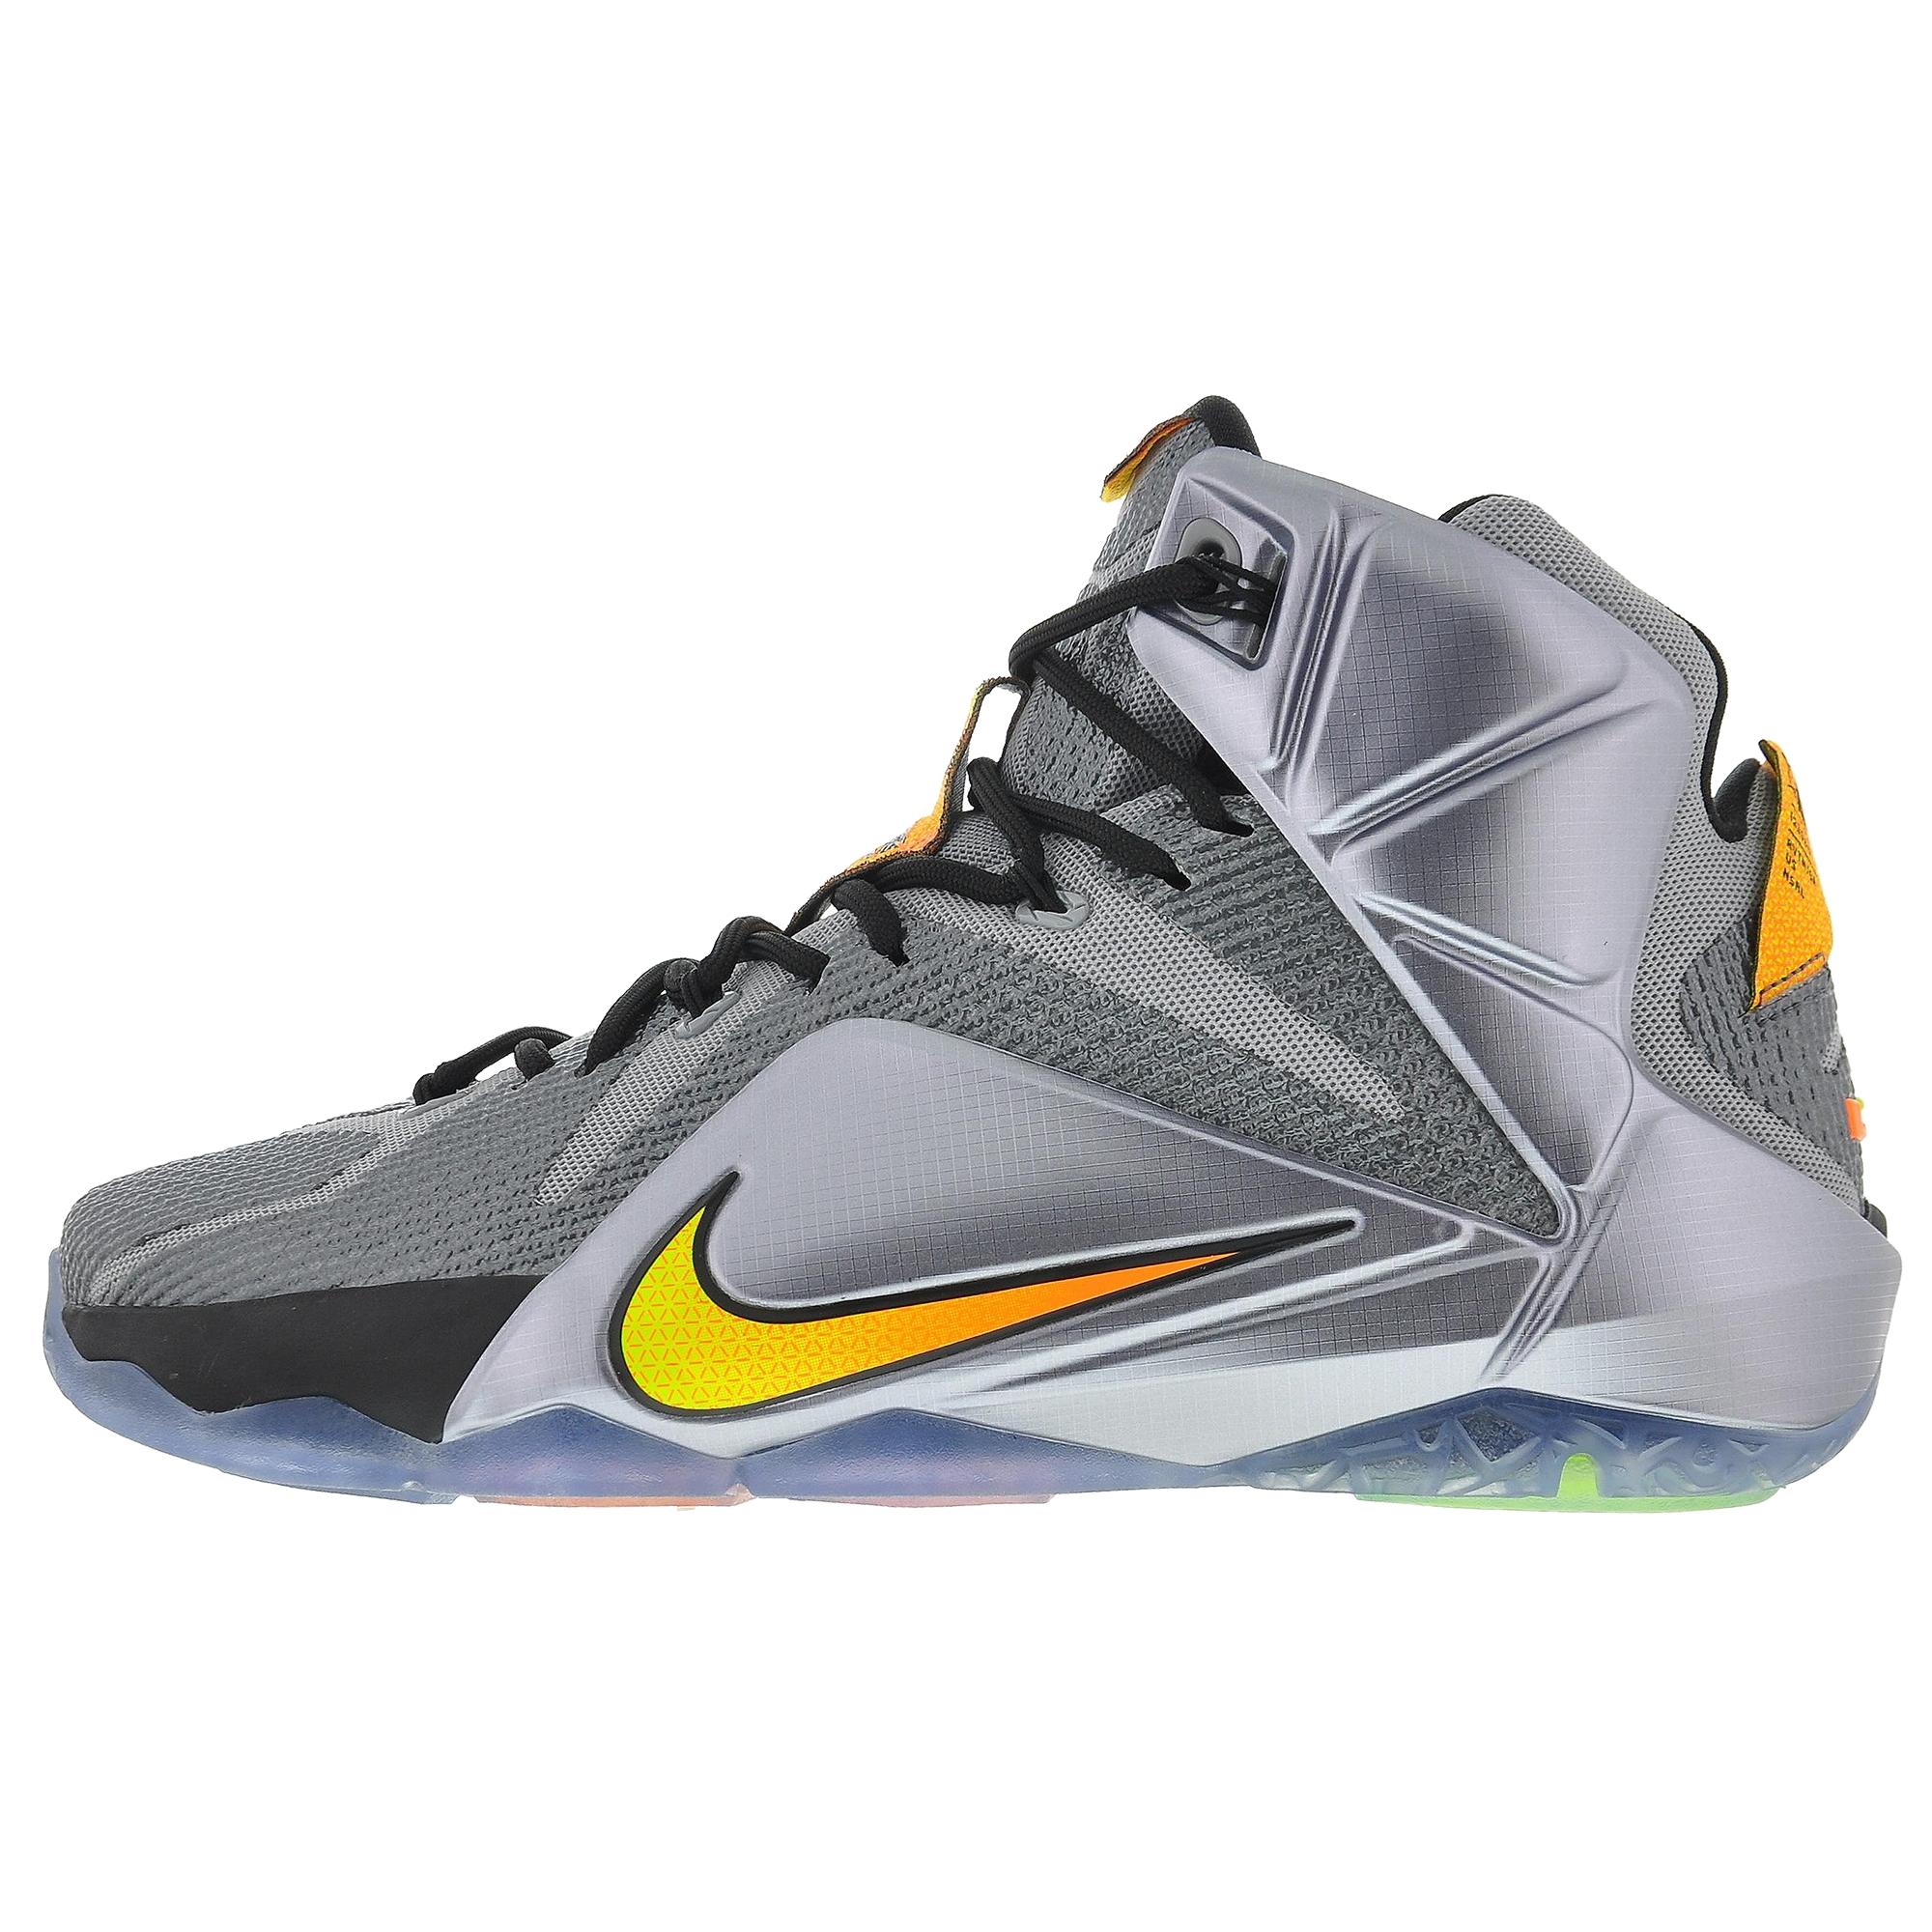 new product 0fdb9 04ca1 Nike LeBron James XII SS15 Erkek Basketbol Ayakkabısı